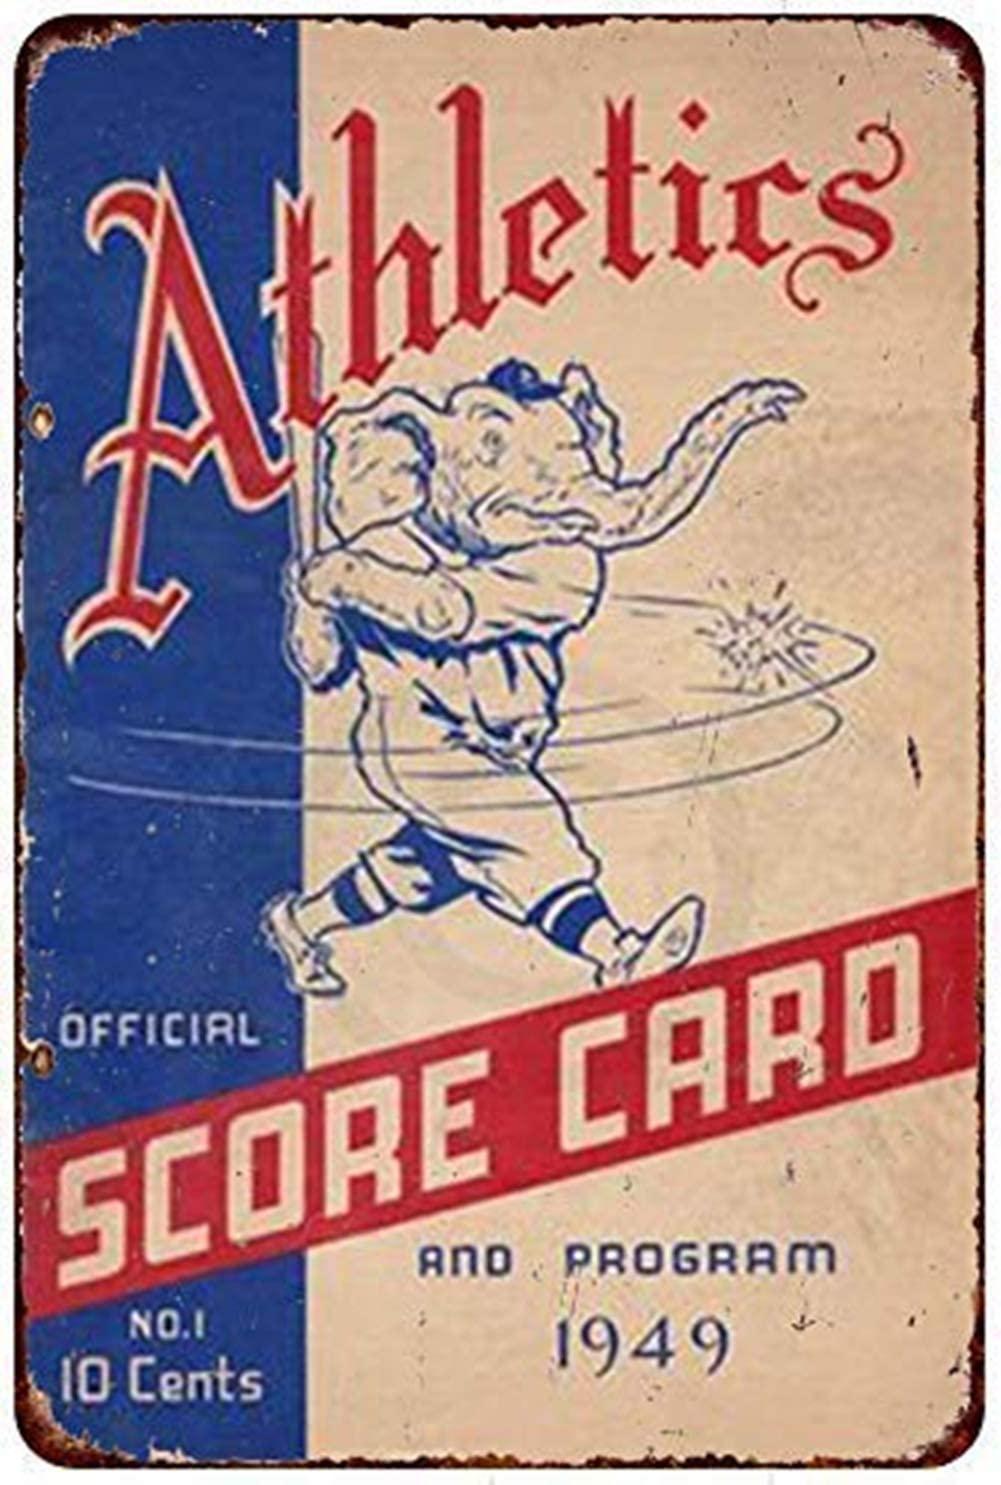 MAIYUAN Metal Tin Signs-New Tin Sign Philadelphia Athletics 1949 scorecard Vintage Aluminum Metal Sign 8x12 Inches (H4-P047)